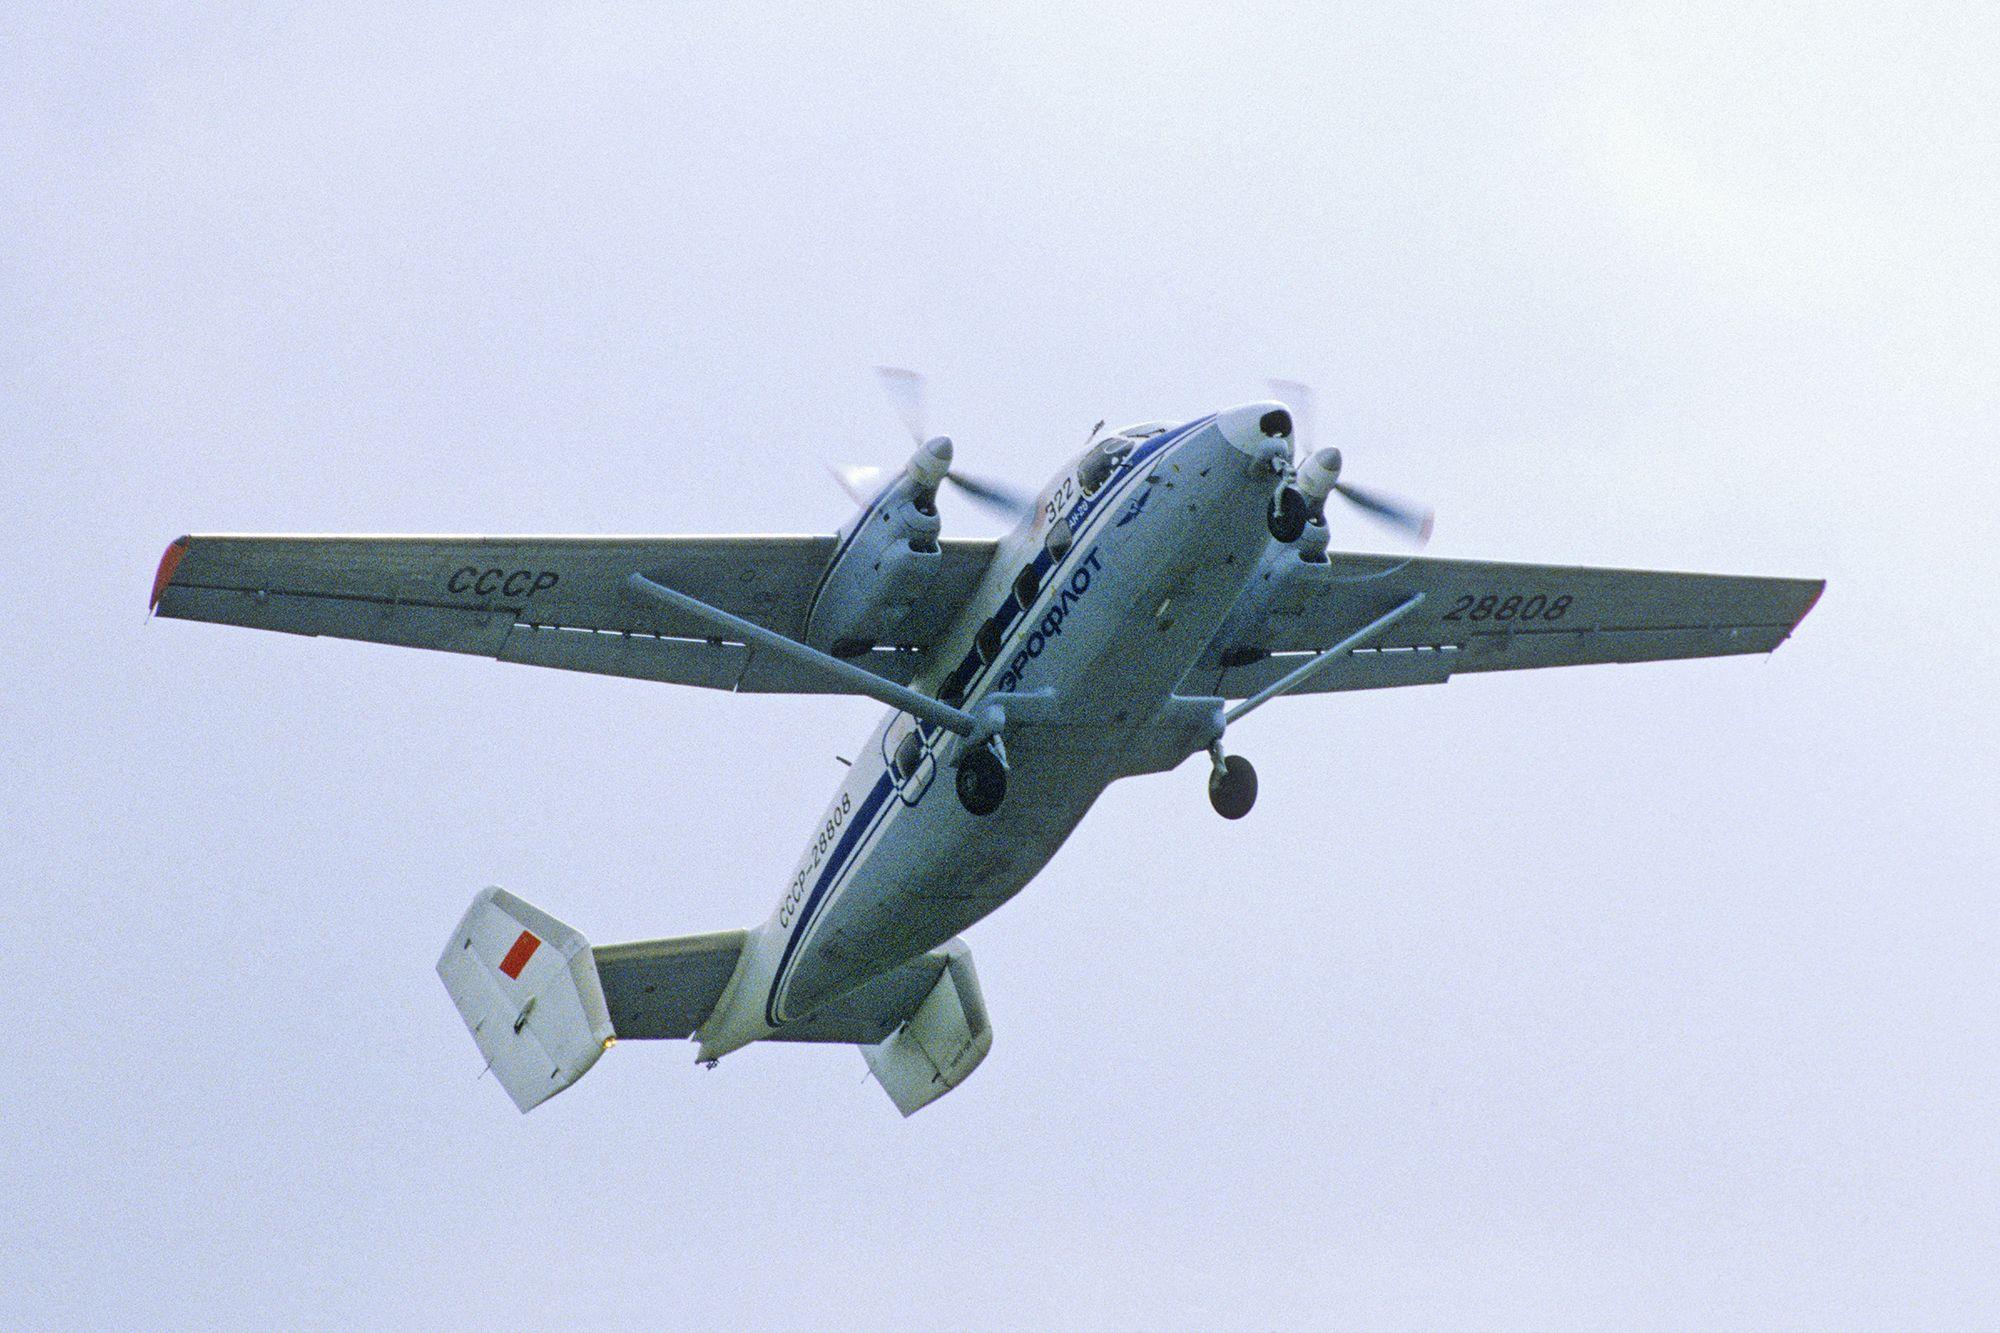 Russian 'miracle' as passengers survive hard plane landing in Siberia